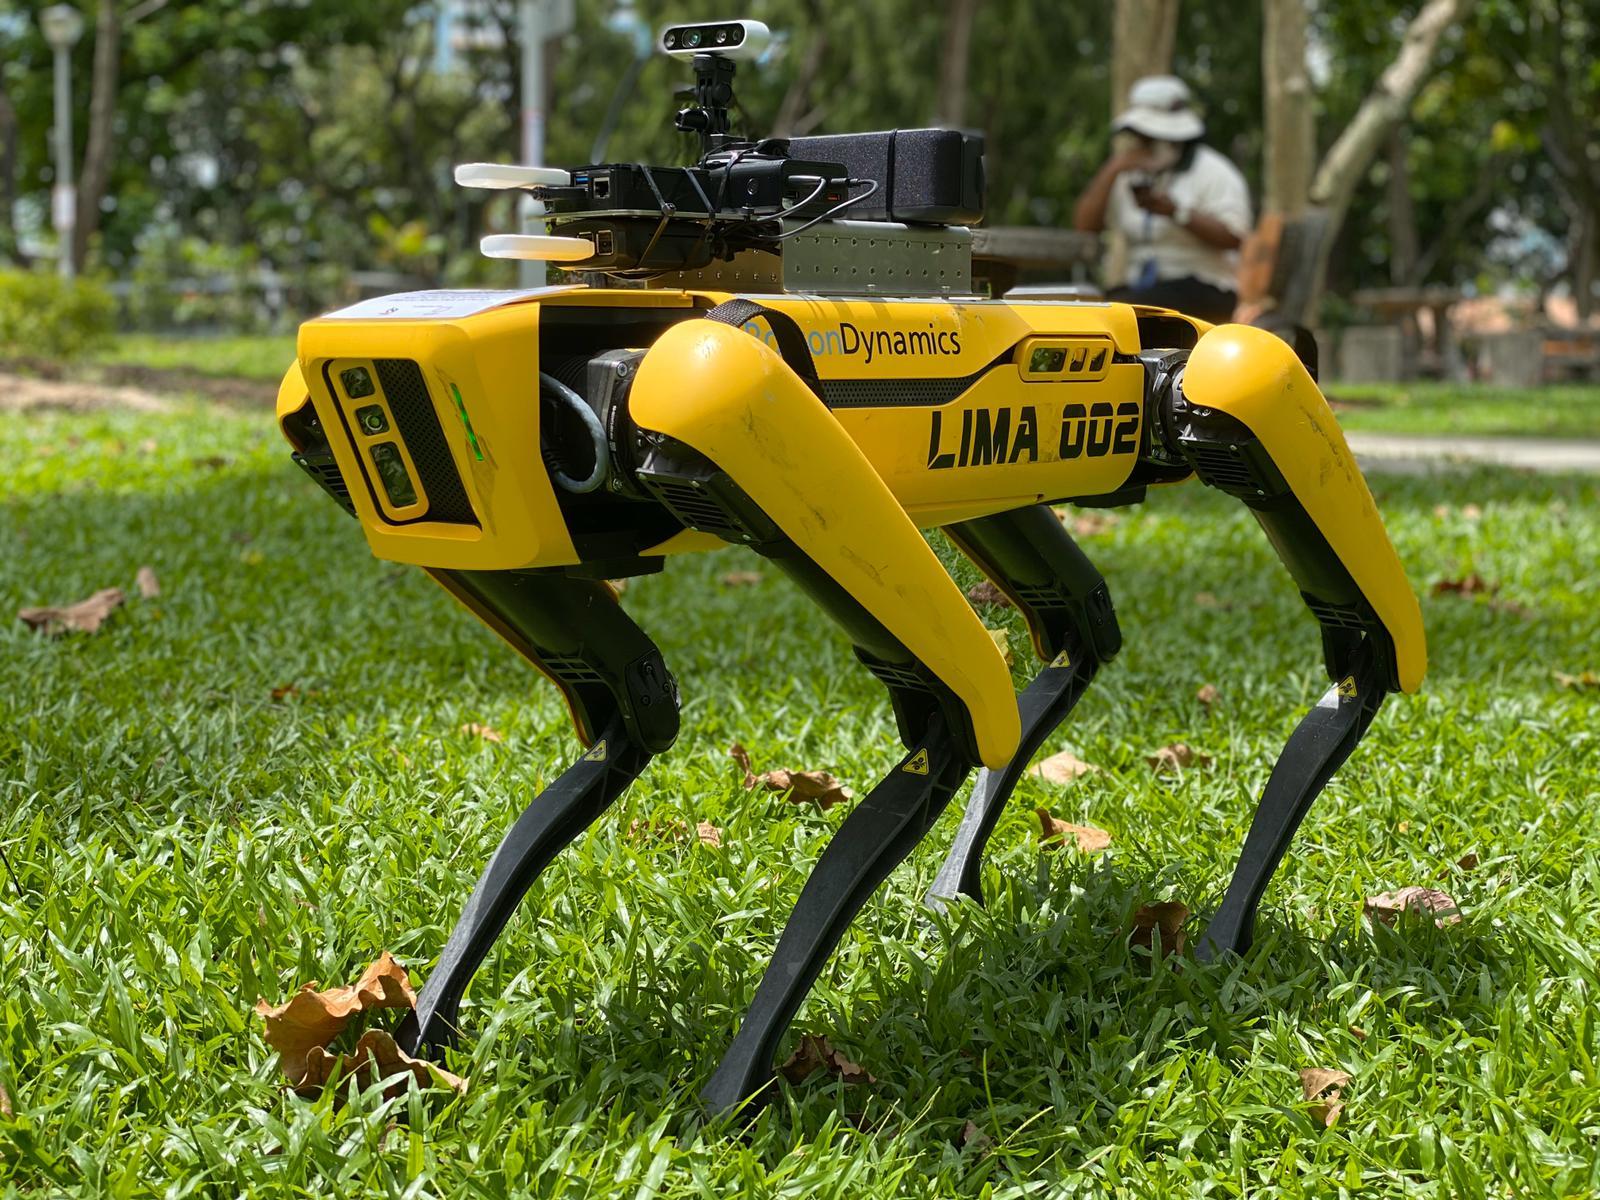 Big push for AI proves fruitful and useful